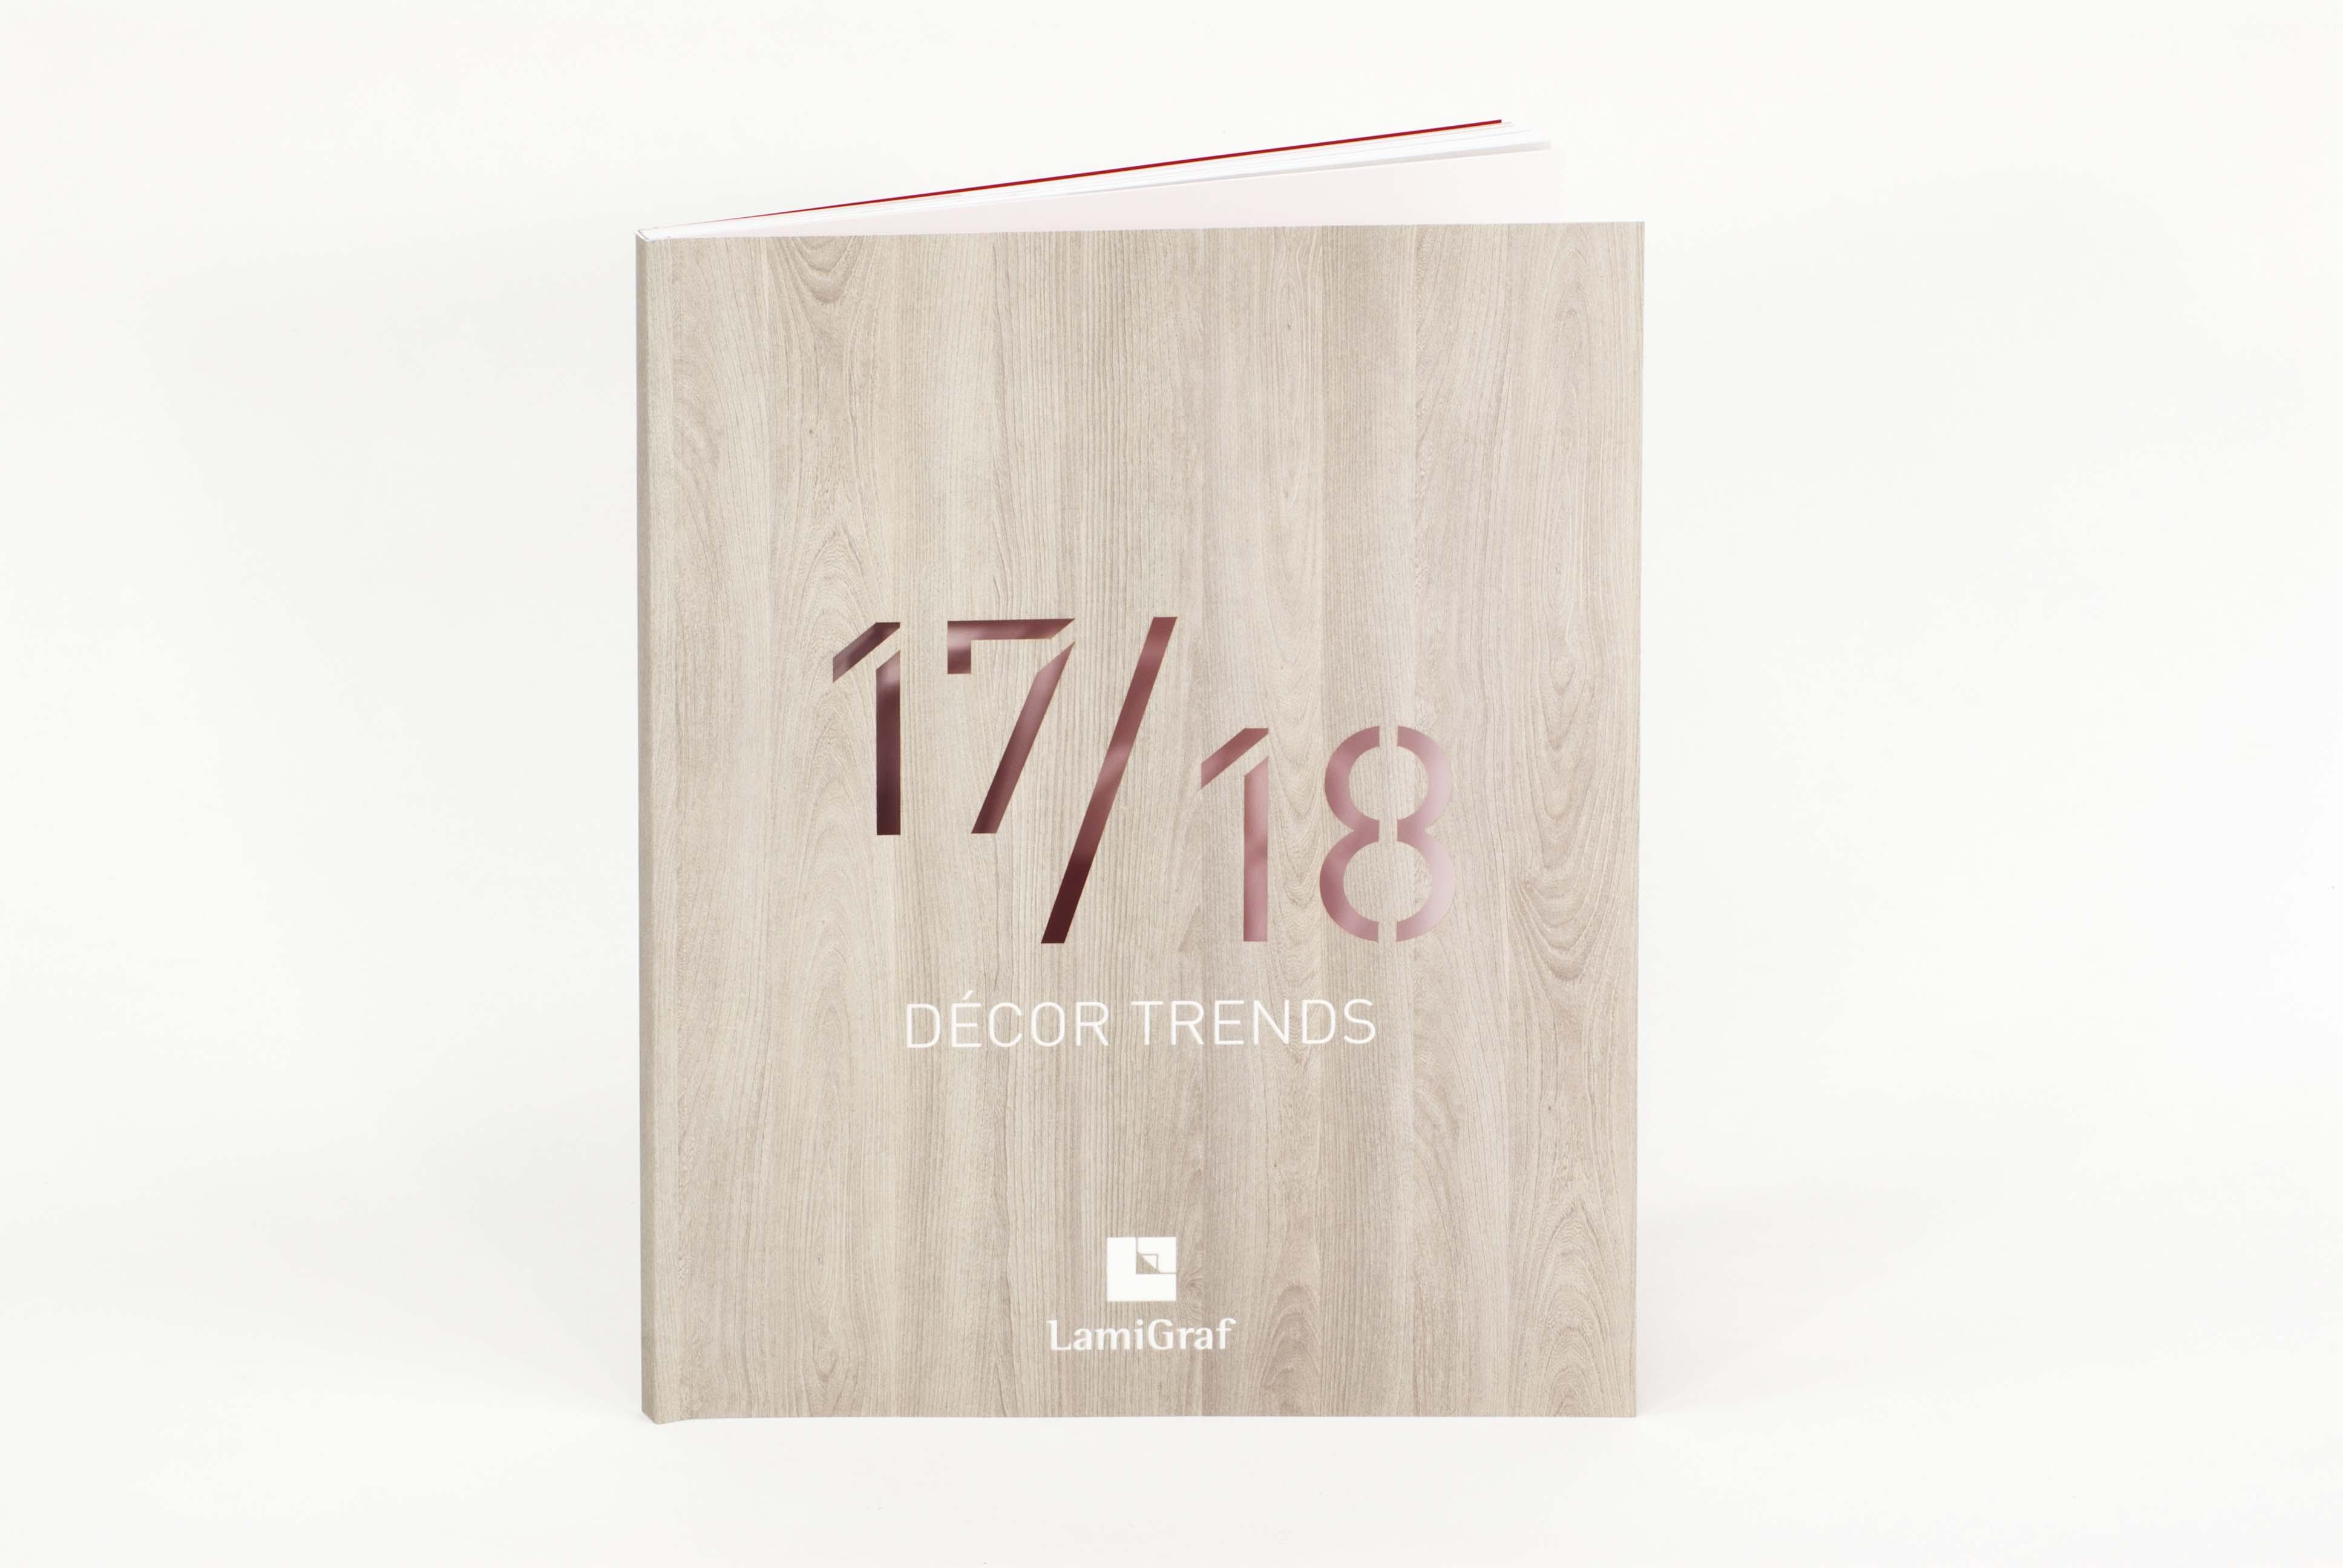 0491_lamigraf_decor_trends_1